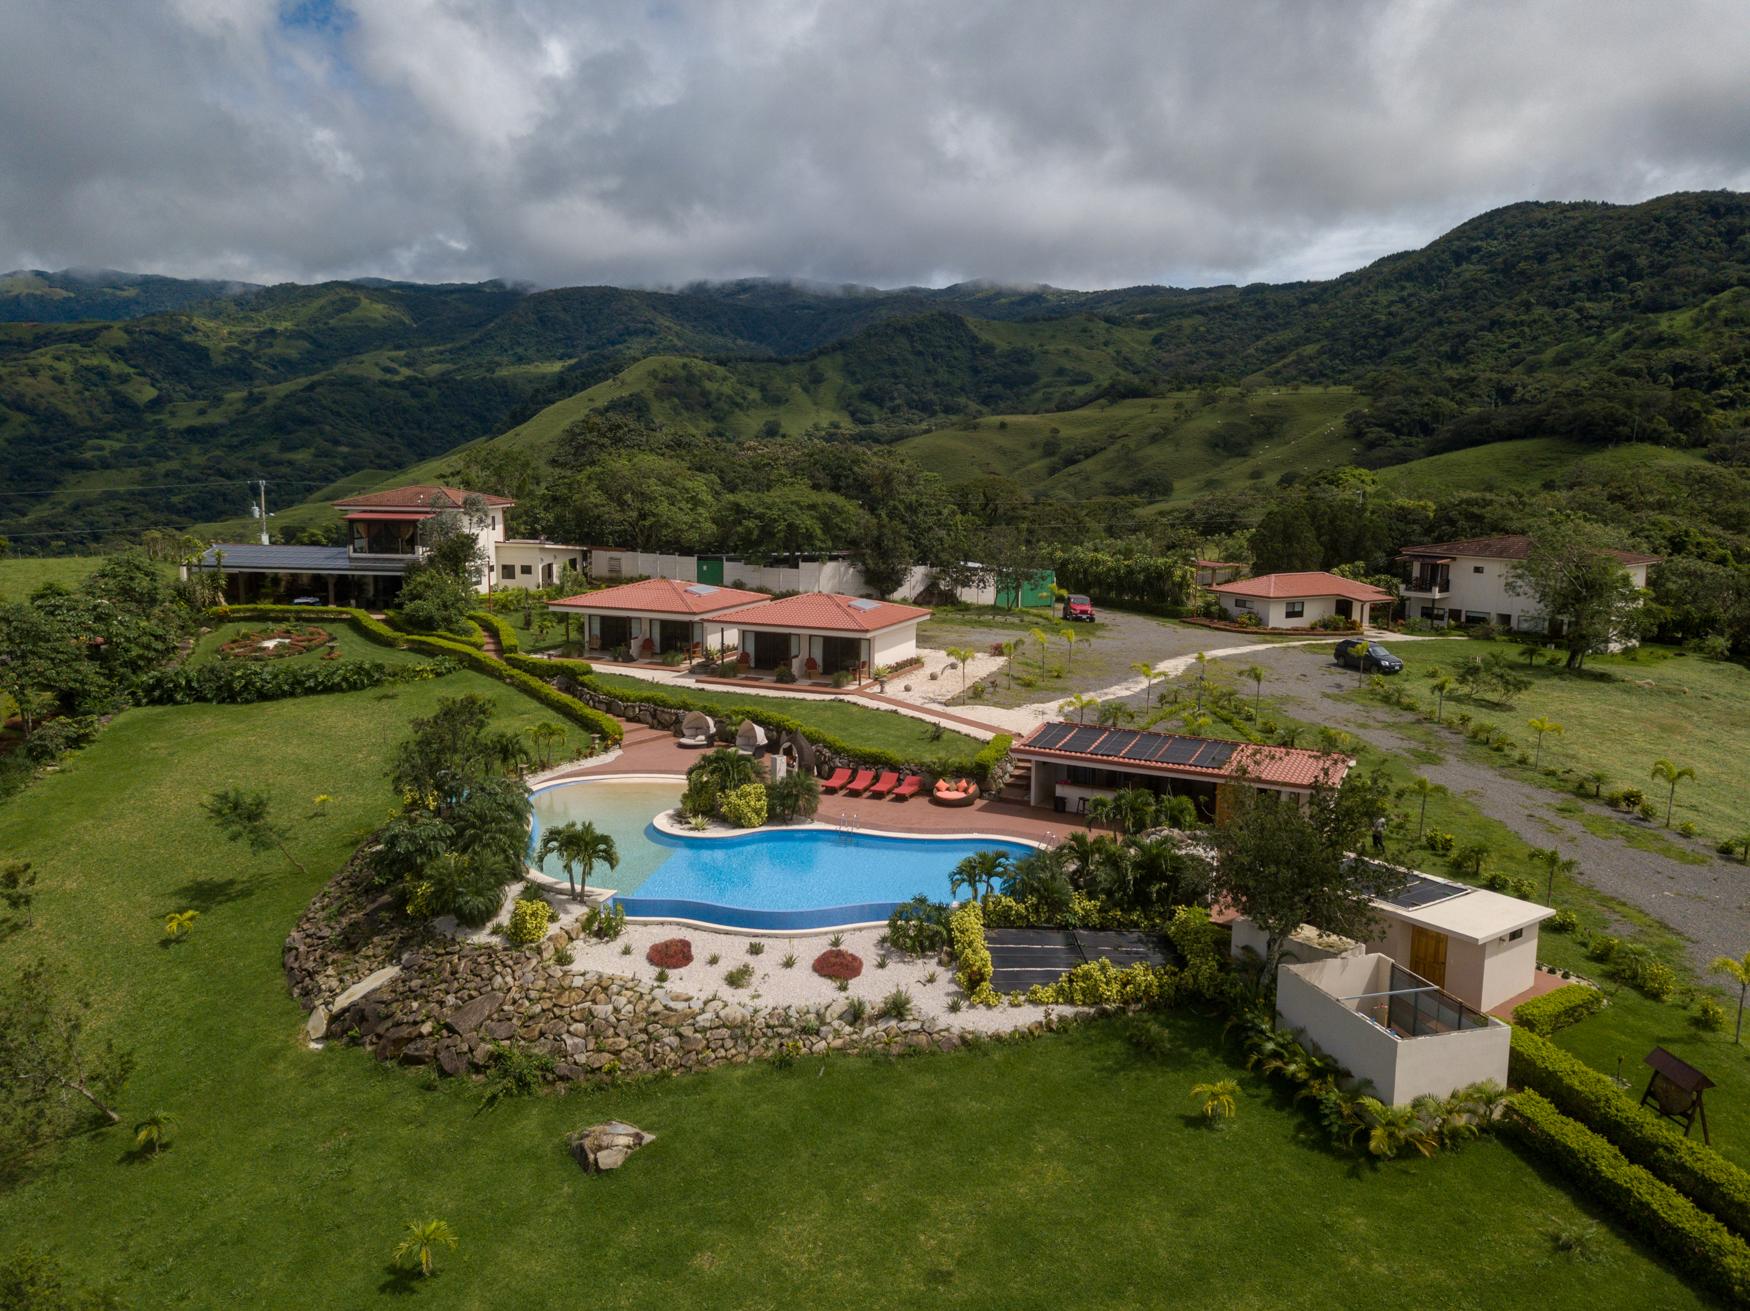 Yoga-Retreat-Drone-Photography-Costa-Rica-22.jpg